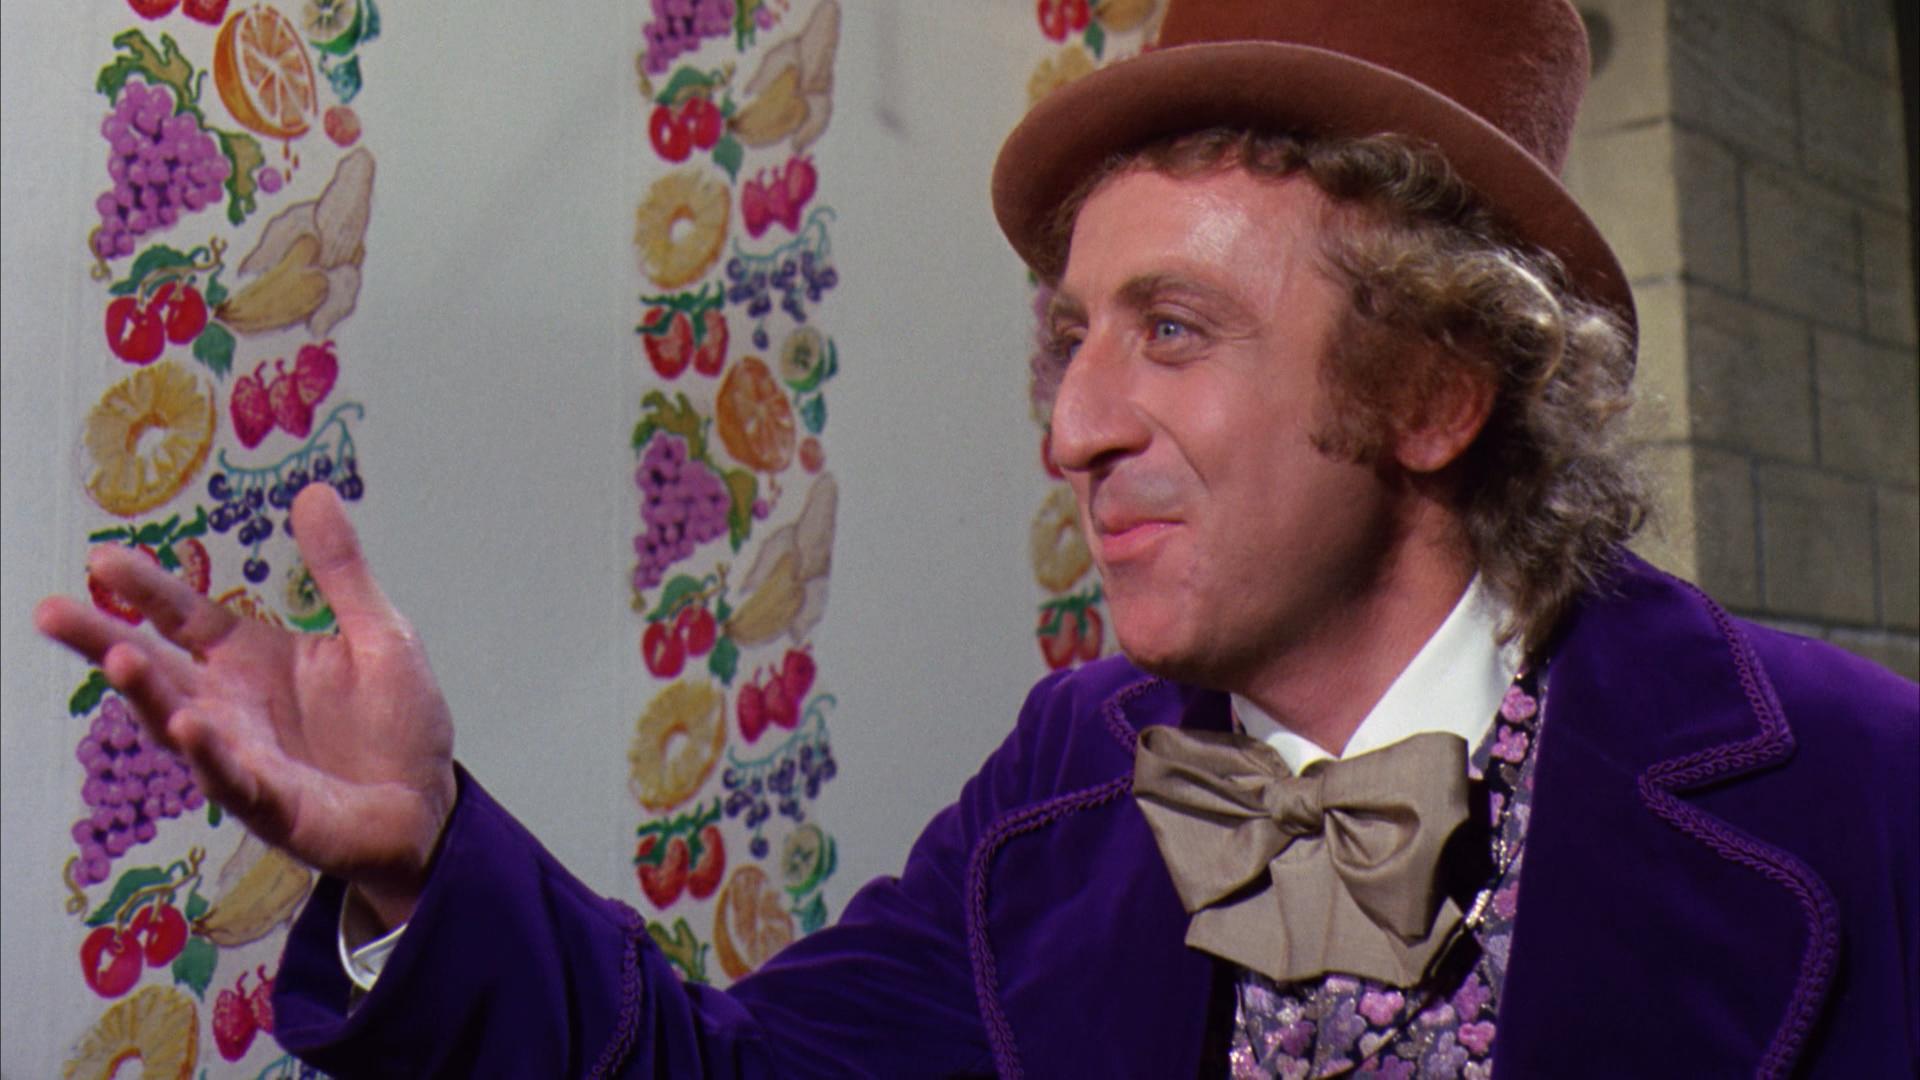 RIP: Gene Wilder dies at 83 | Willy wonka, Chocolate factory and Movie